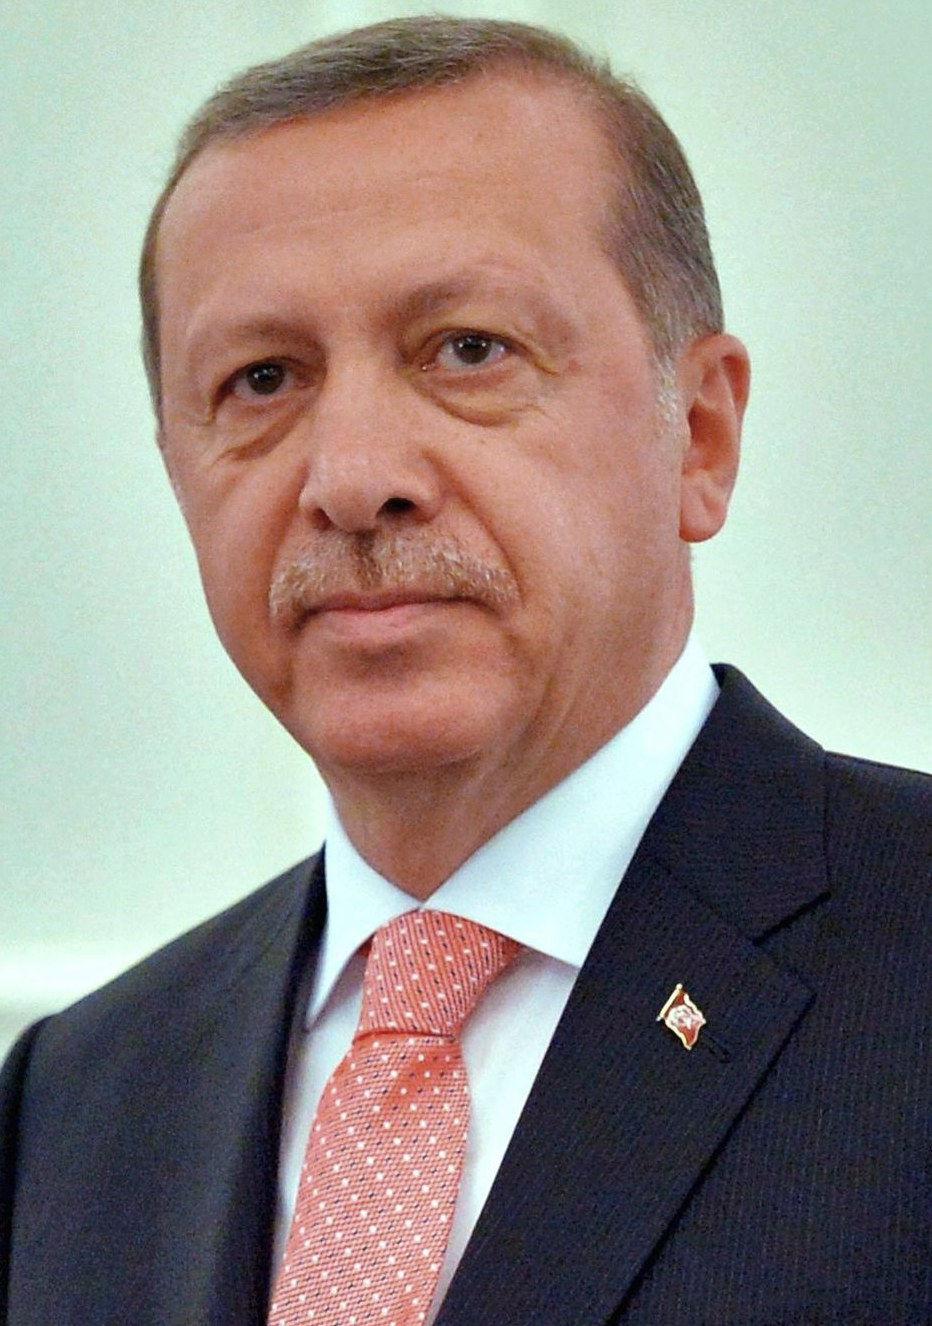 Photo of Recep Tayyip Erdoğan: President of Turkey, former Prime Minister